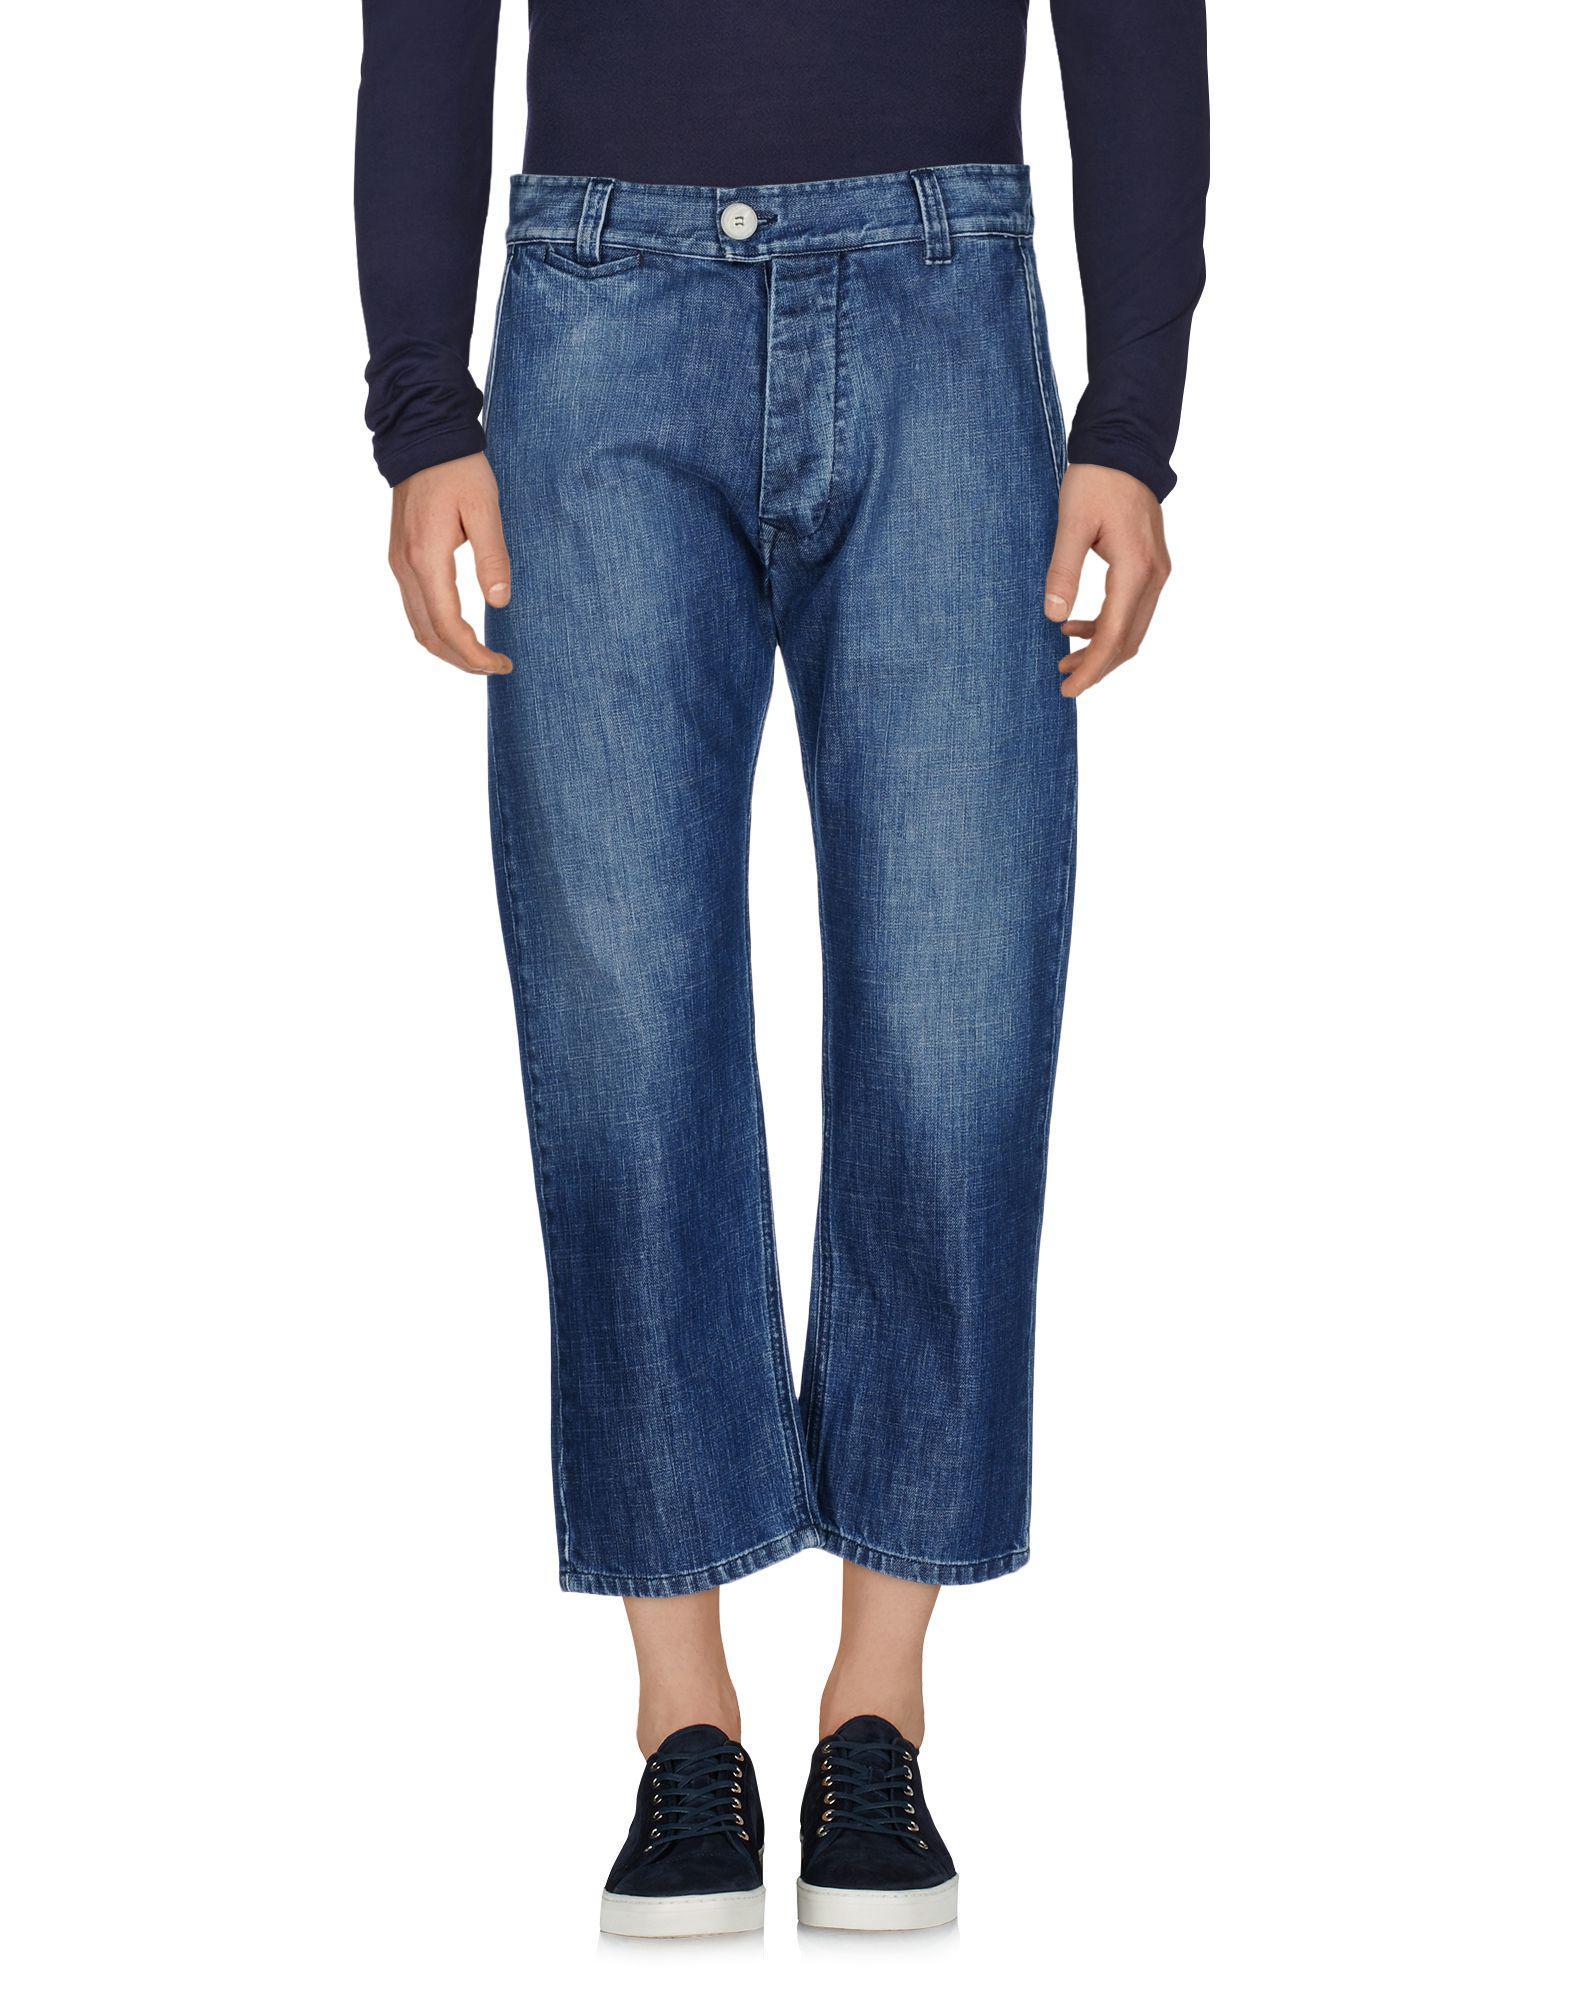 DENIM - Denim trousers Christian Pellizzari 1DRBy